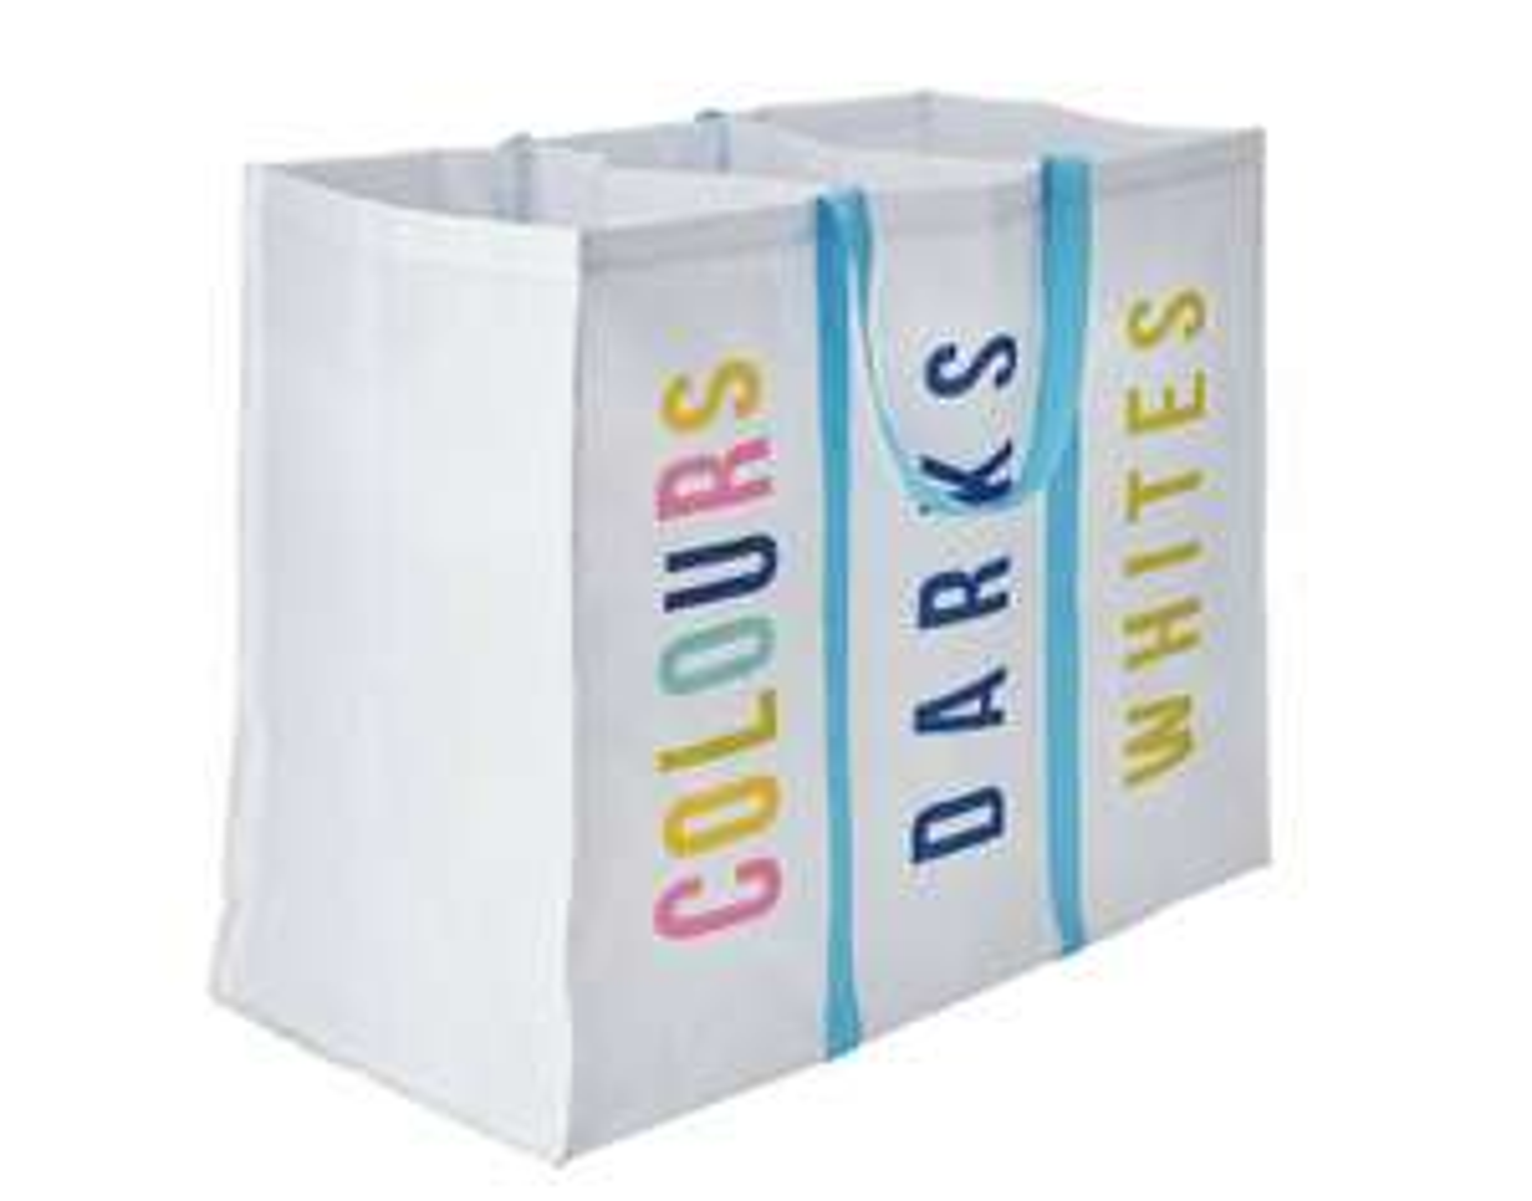 Argos Home Bright Laundry Sorter - £9 (£3.95 delivery) @ Argos